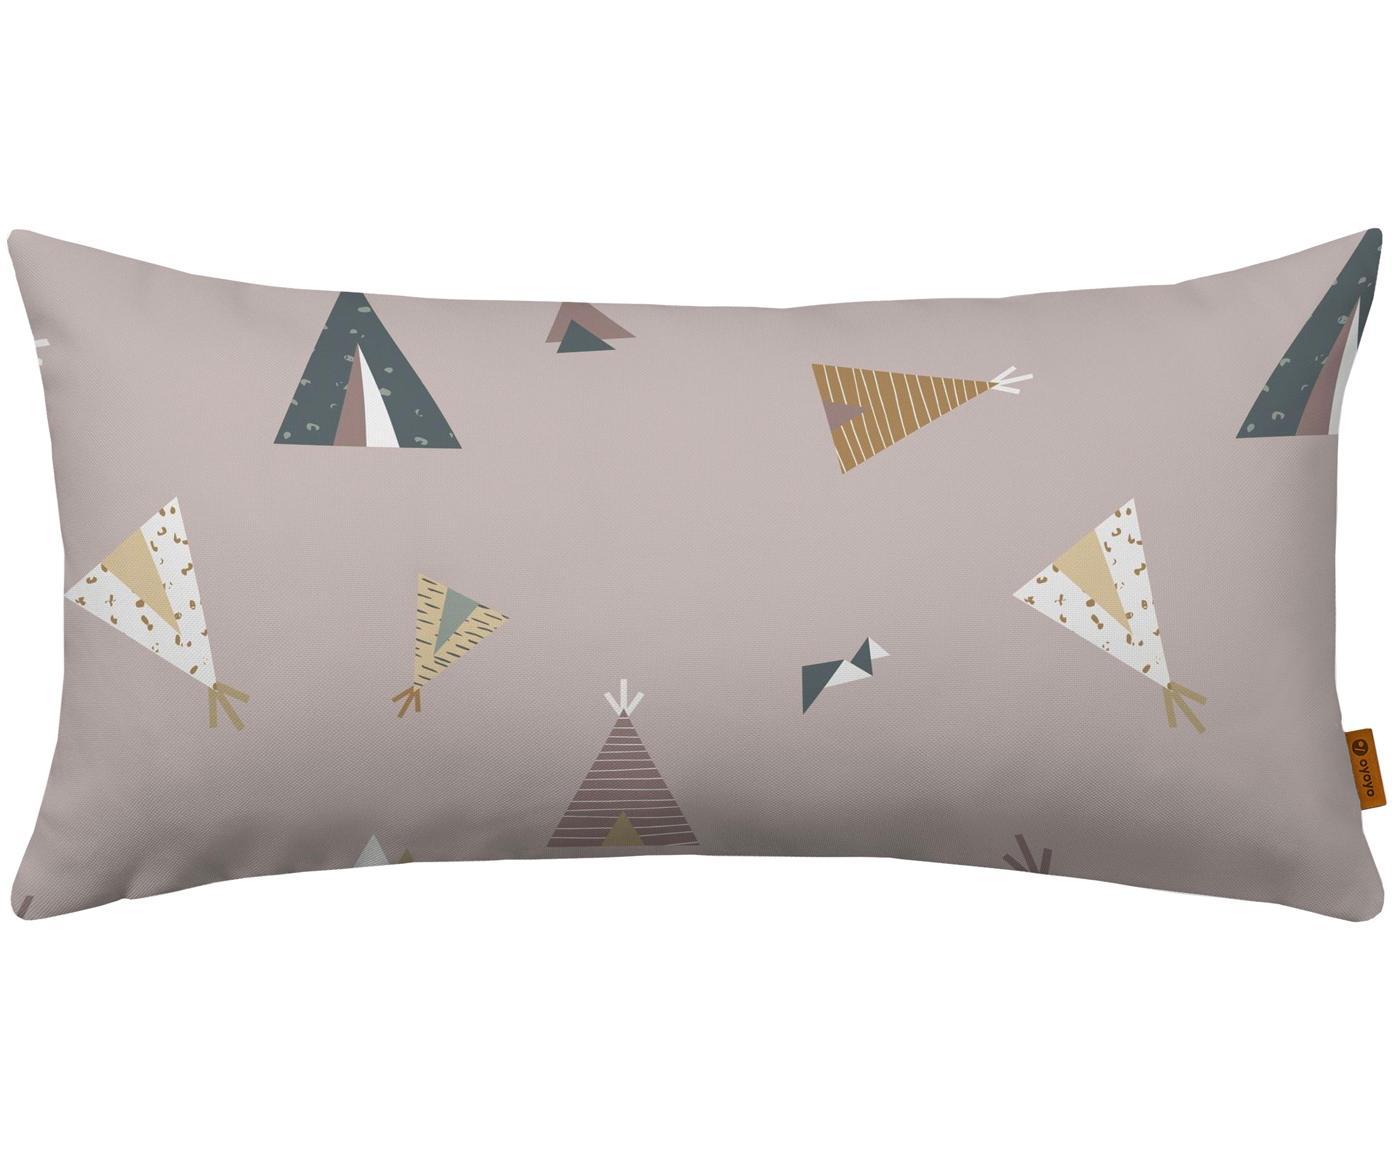 Kissen Teepee, mit Inlett, Bezug: Baumwolle, Rosa, Mehrfarbig, 30 x 60 cm